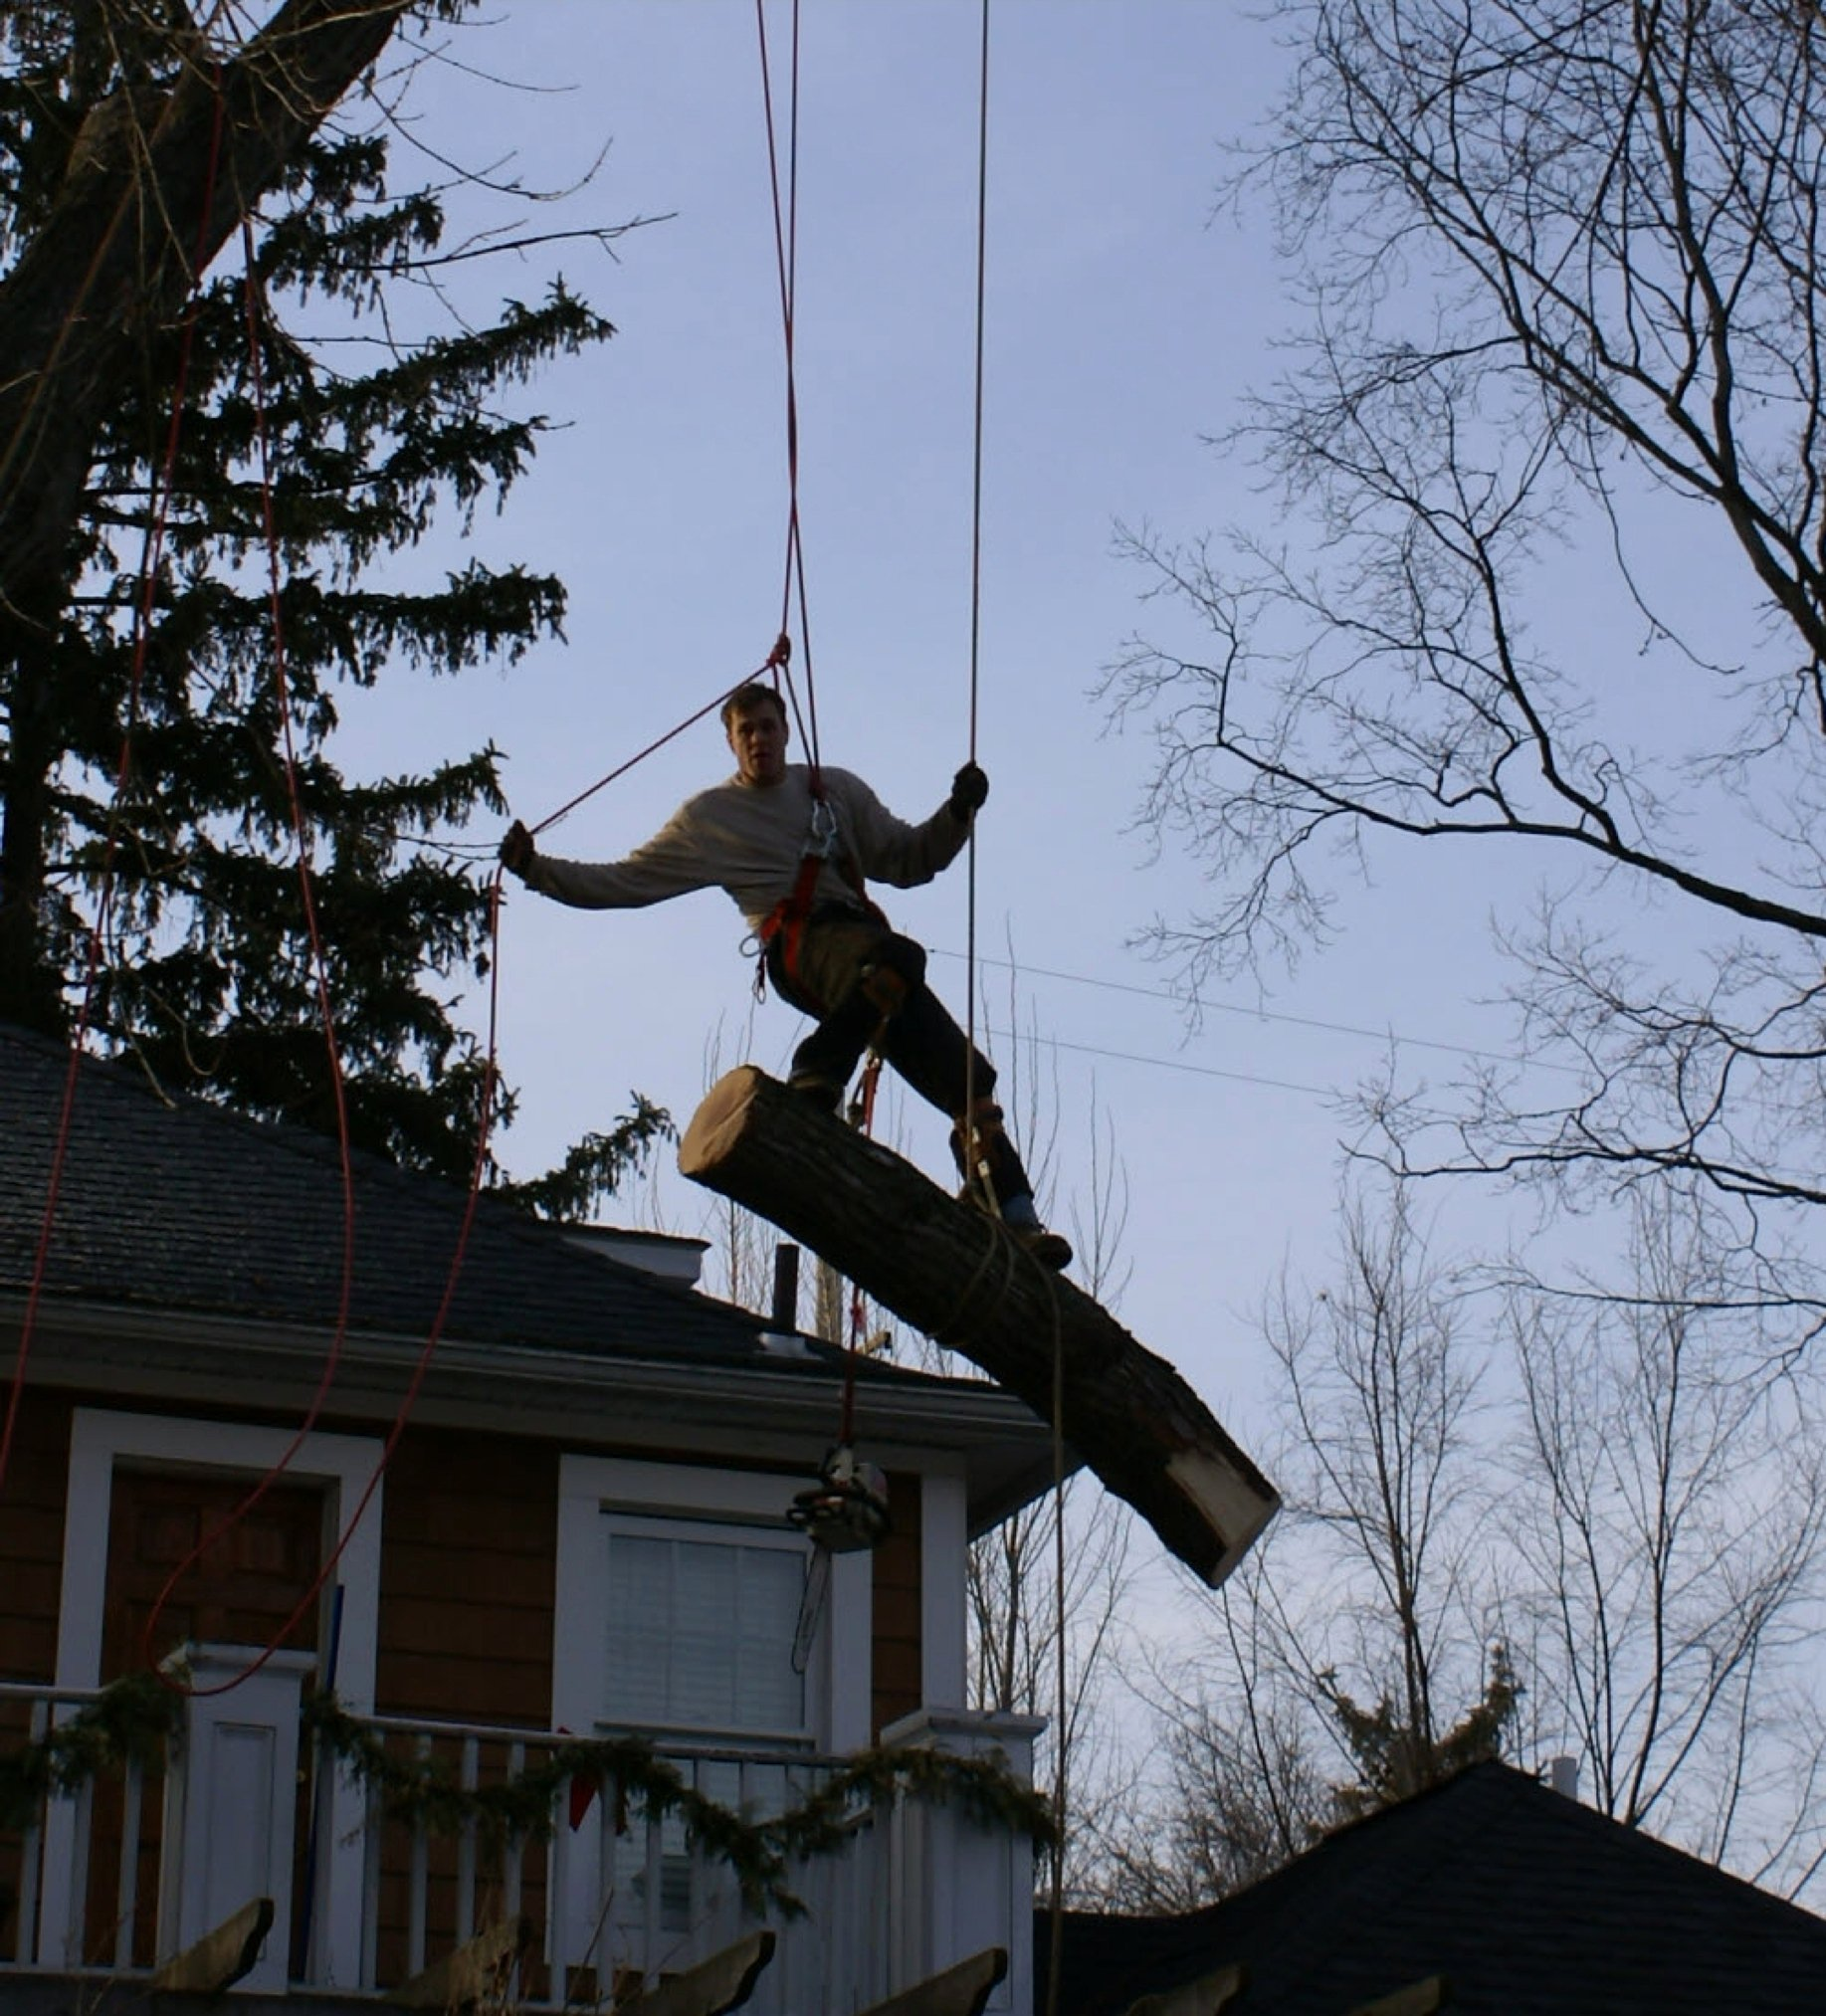 Tree Service Estimate Template Elegant Royal Oak Michigan Tree Service